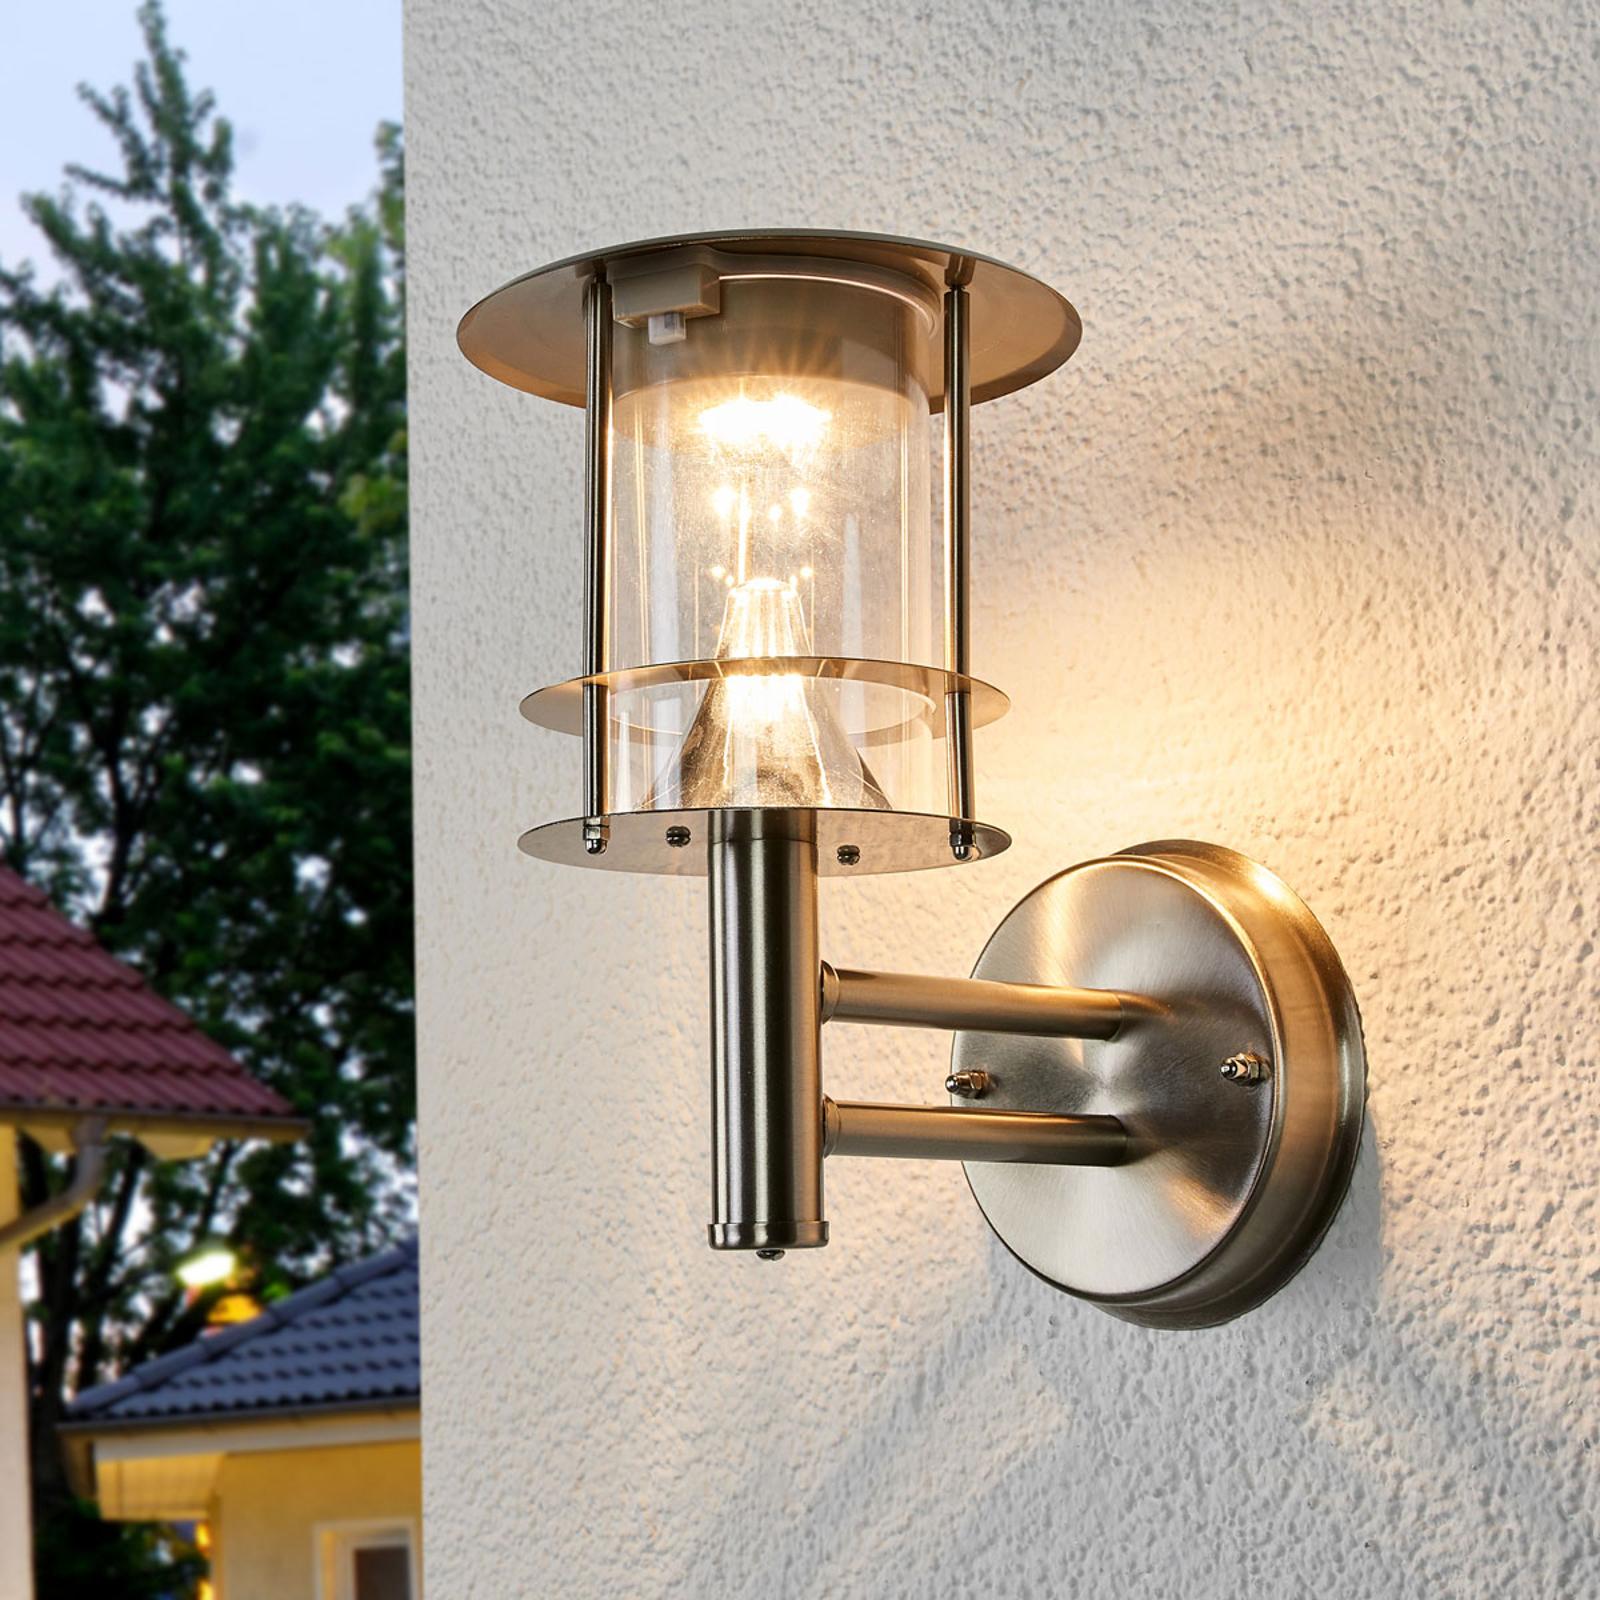 Roestvrijstalen solar buitenwandlamp Sumaya, LED